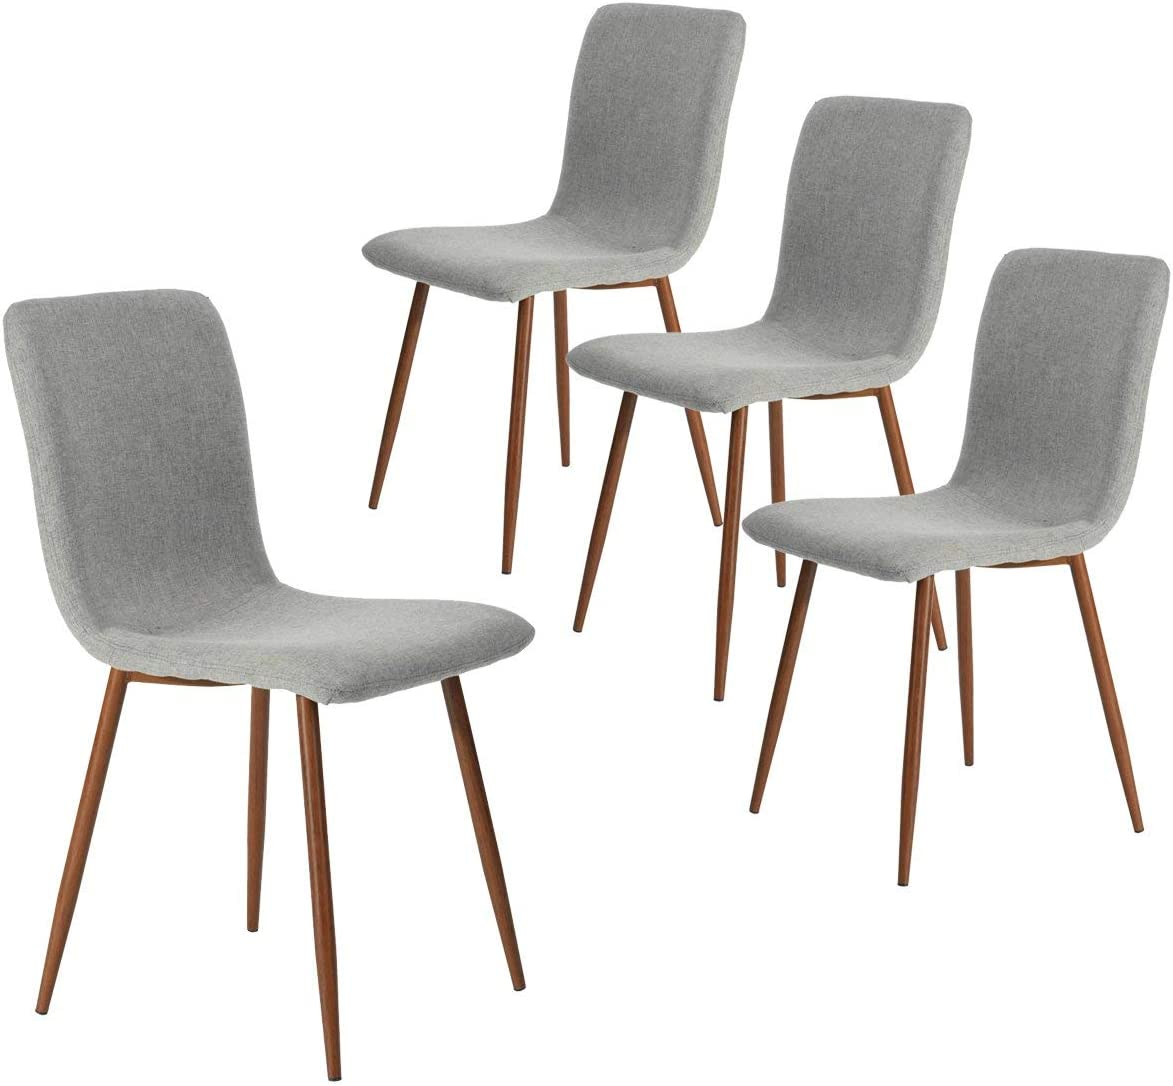 blu Set di 4 sedie da pranzo da cucina Montare facilmente cuscino moderno in tessuto Sedia sedile Gambe in metallo Cuscino in tessuto Sedie laterali con robuste gambe in metallo per la cucina